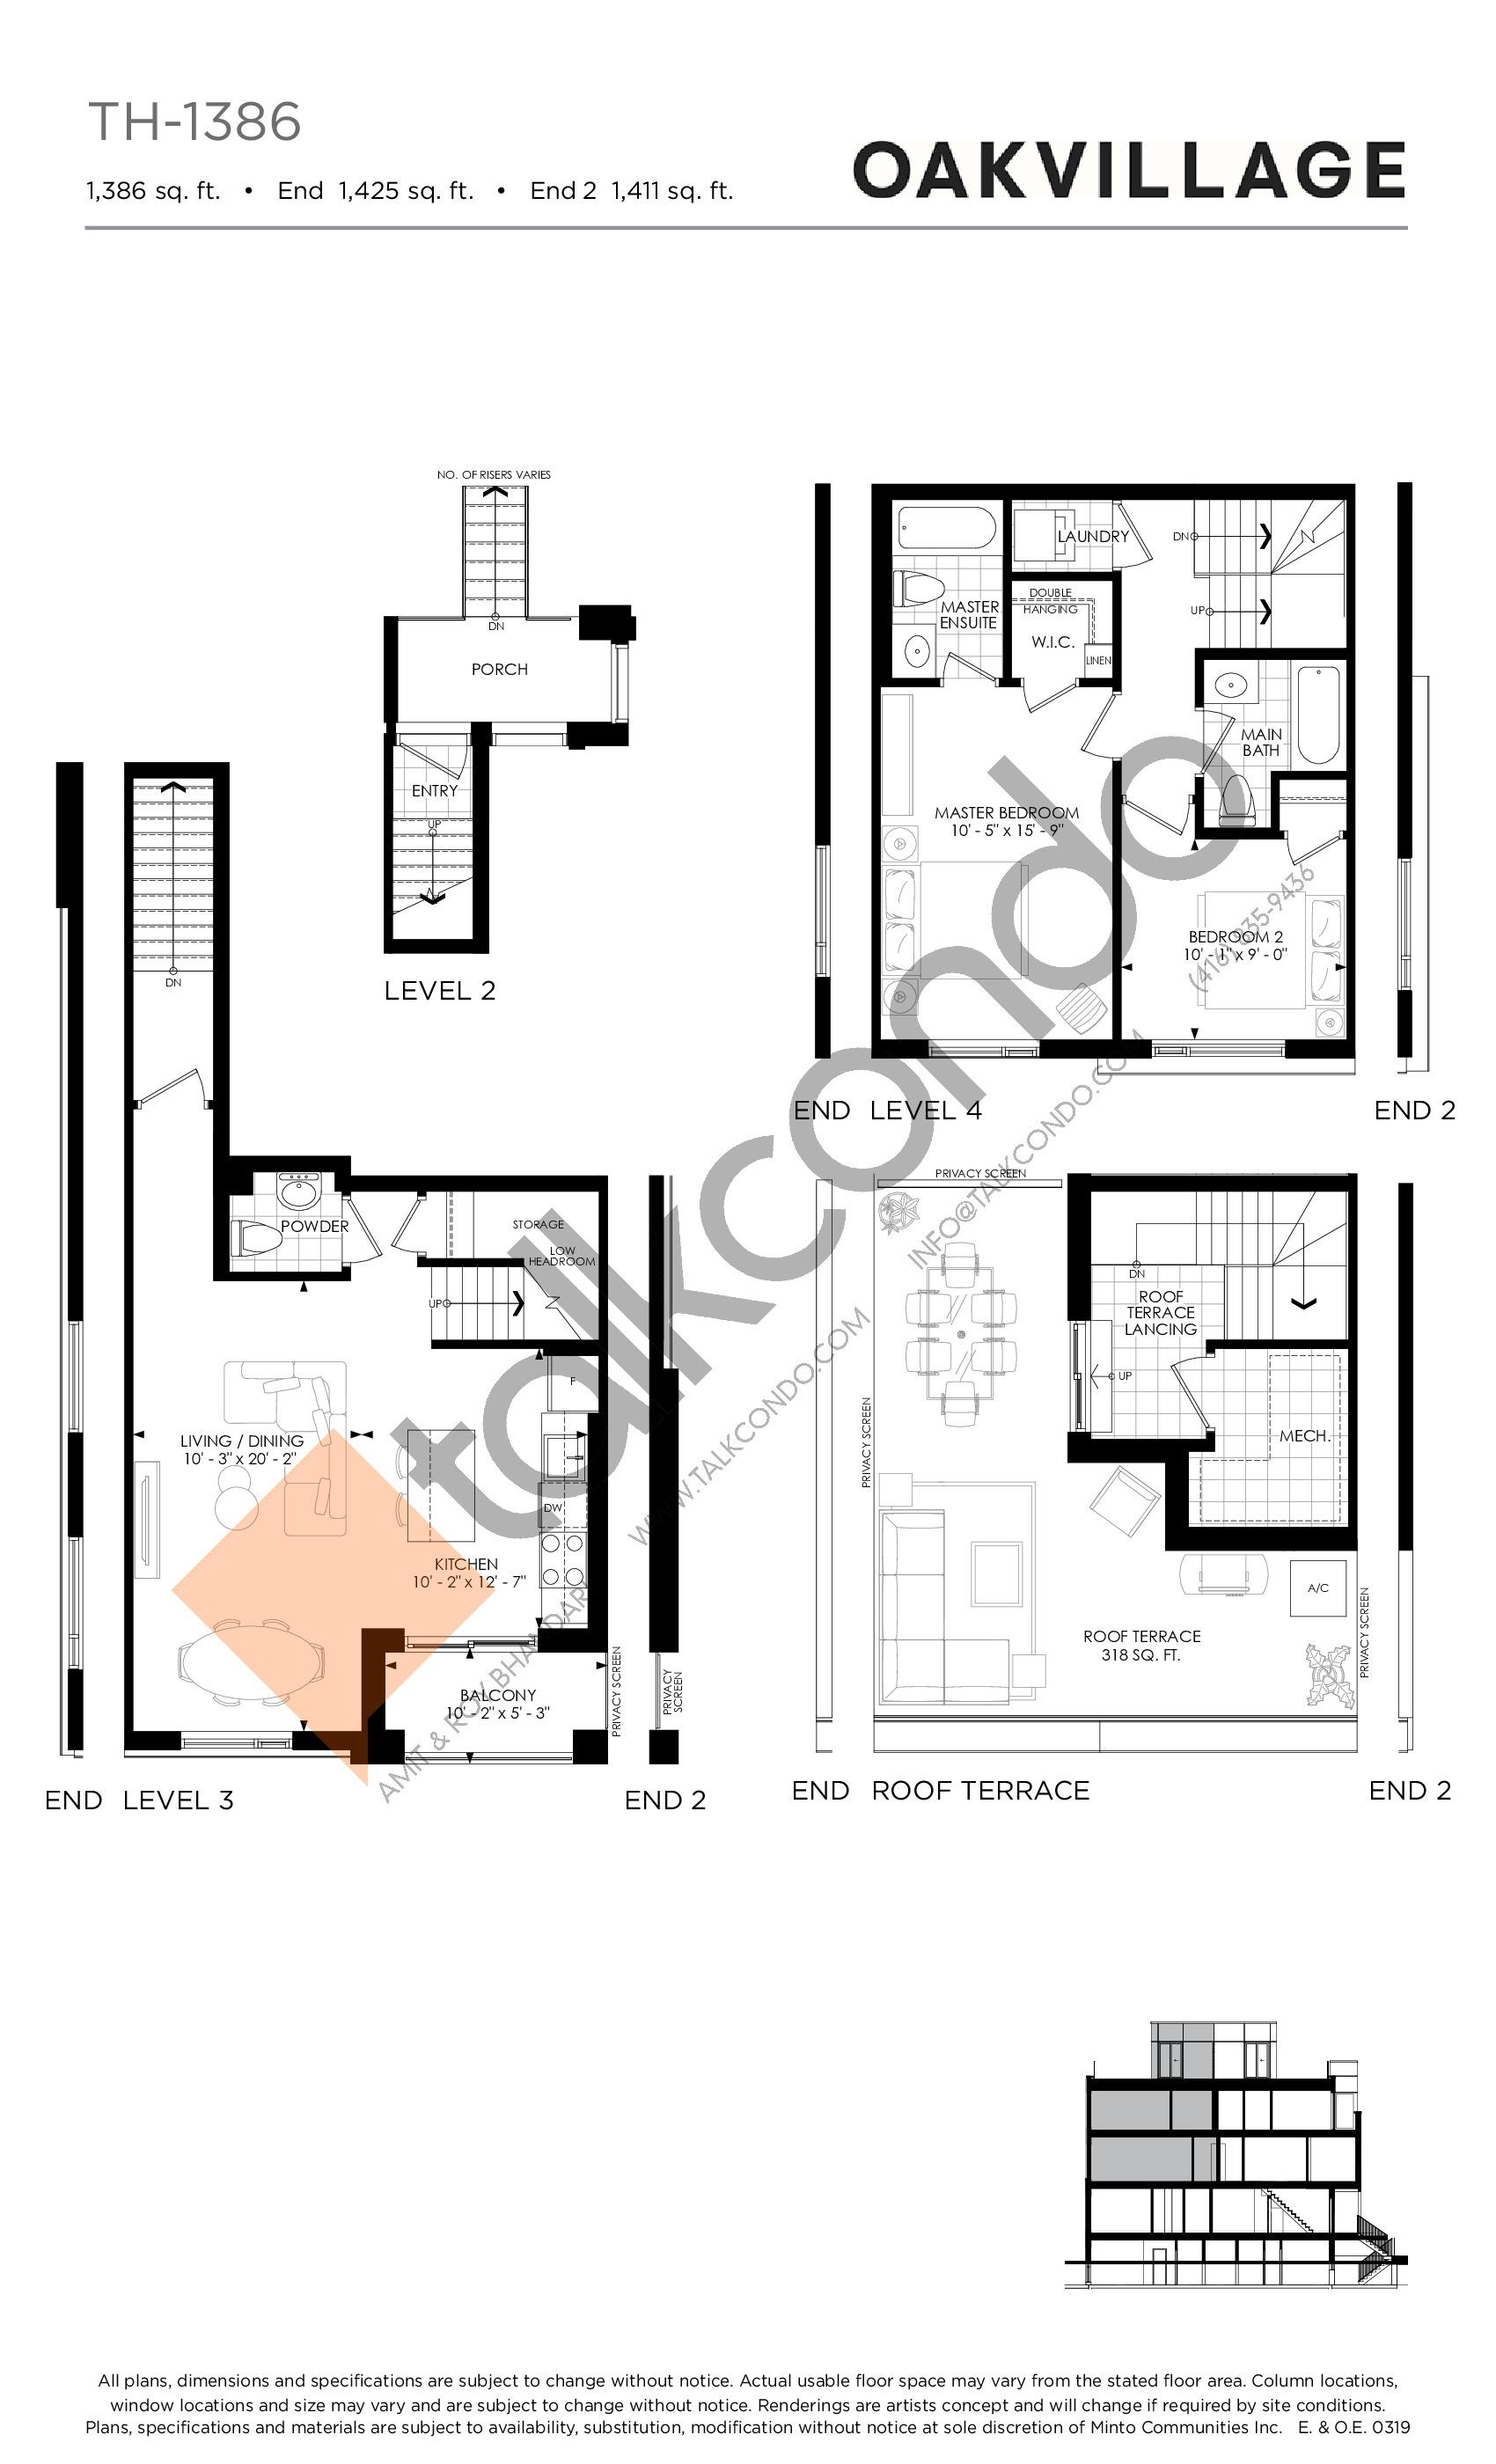 TH-1386 Floor Plan at Minto Oakvillage Condos 1 - 1386 sq.ft